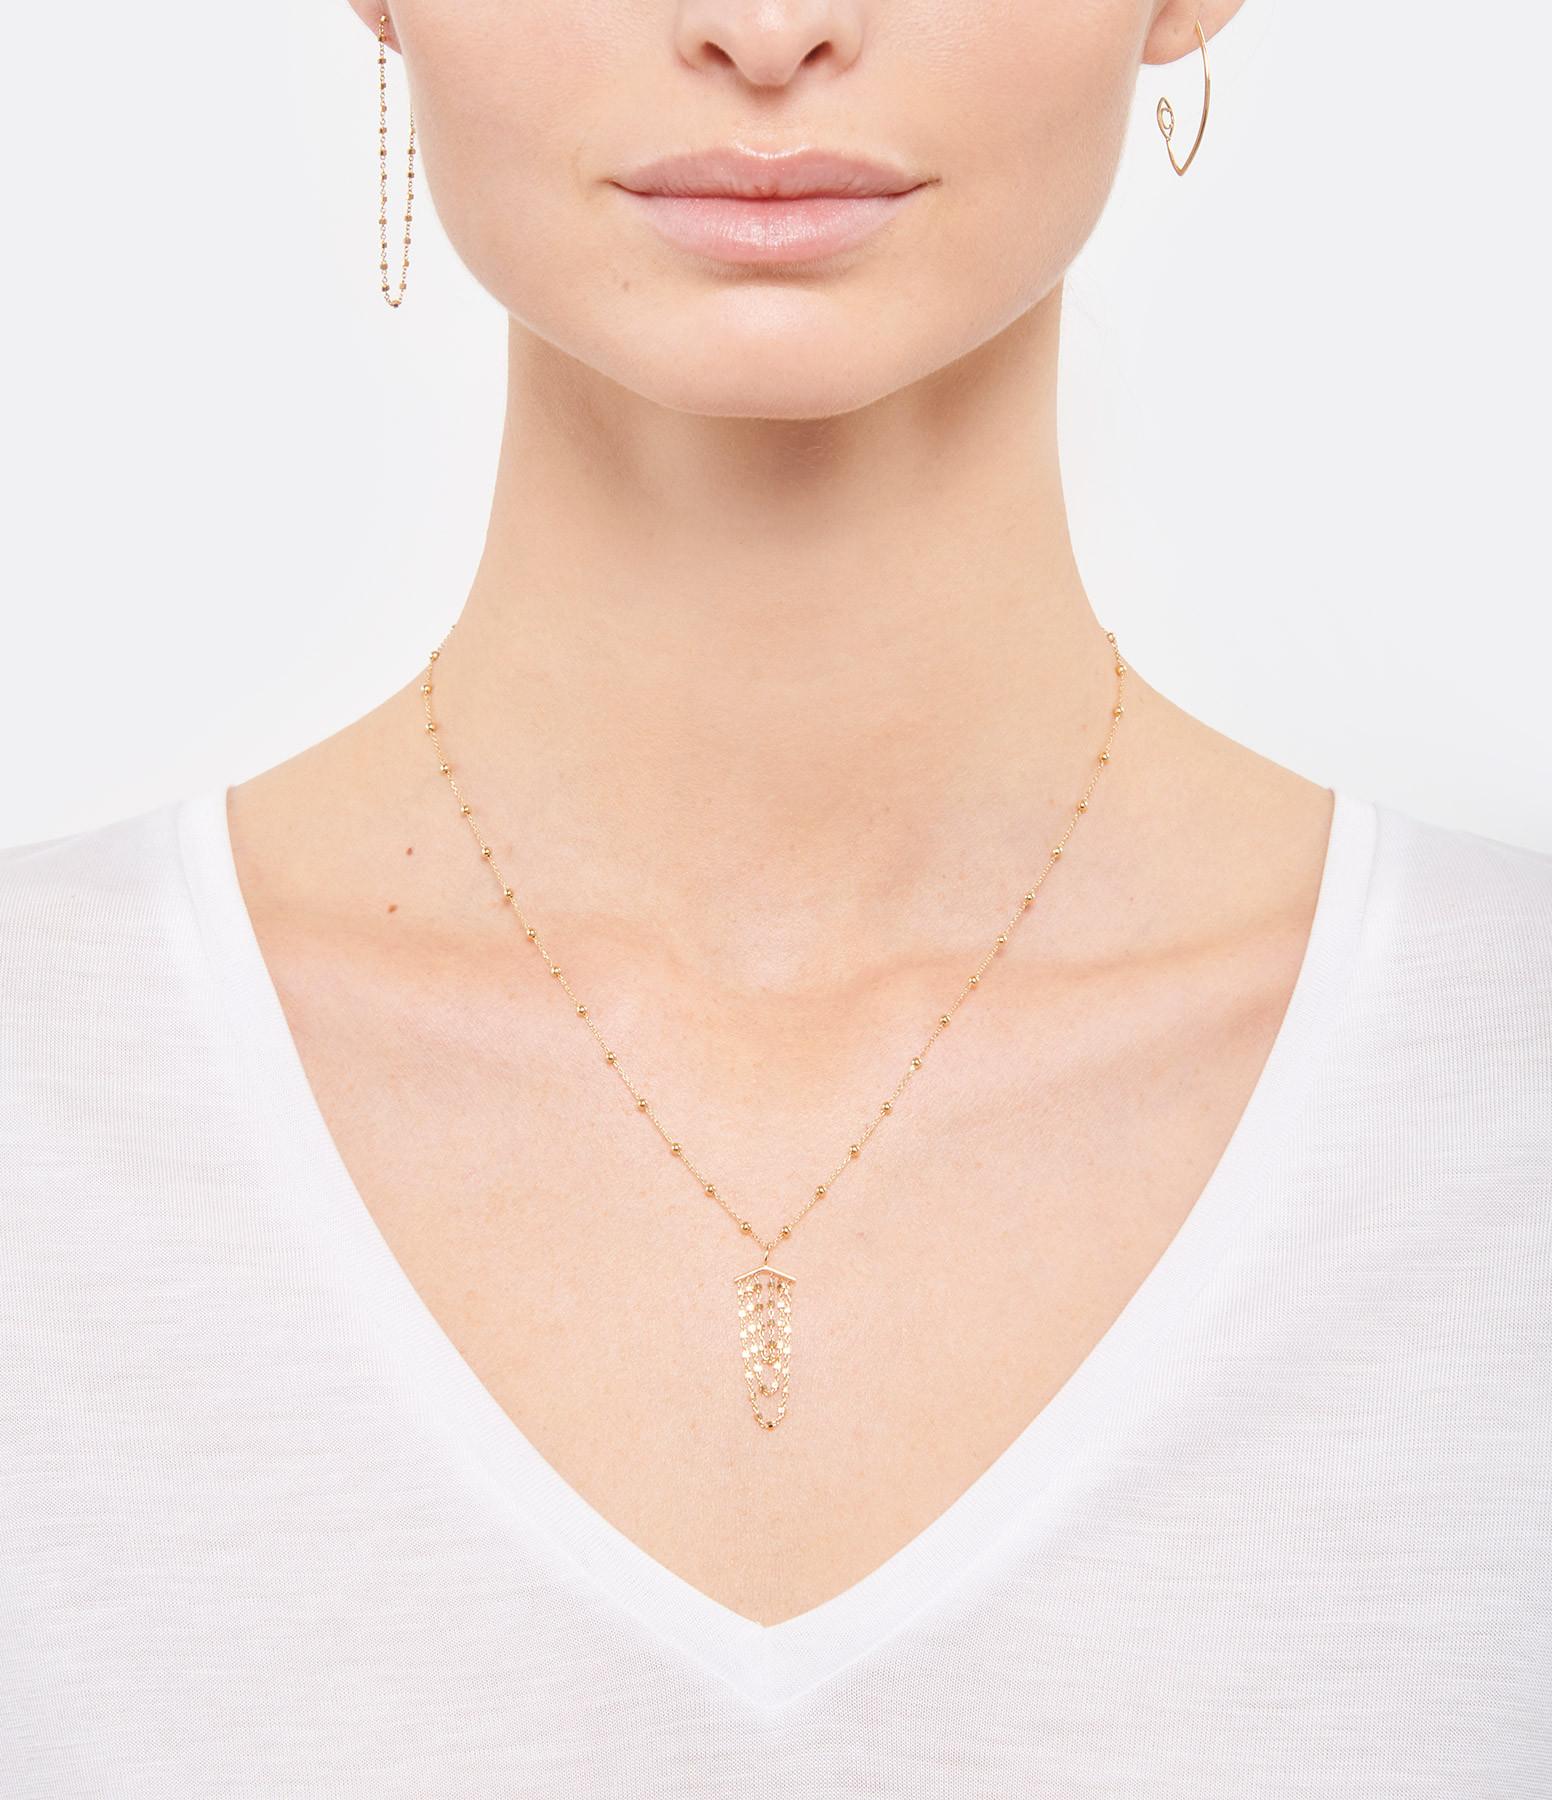 CHARLET - Chaine Boule 45 cm